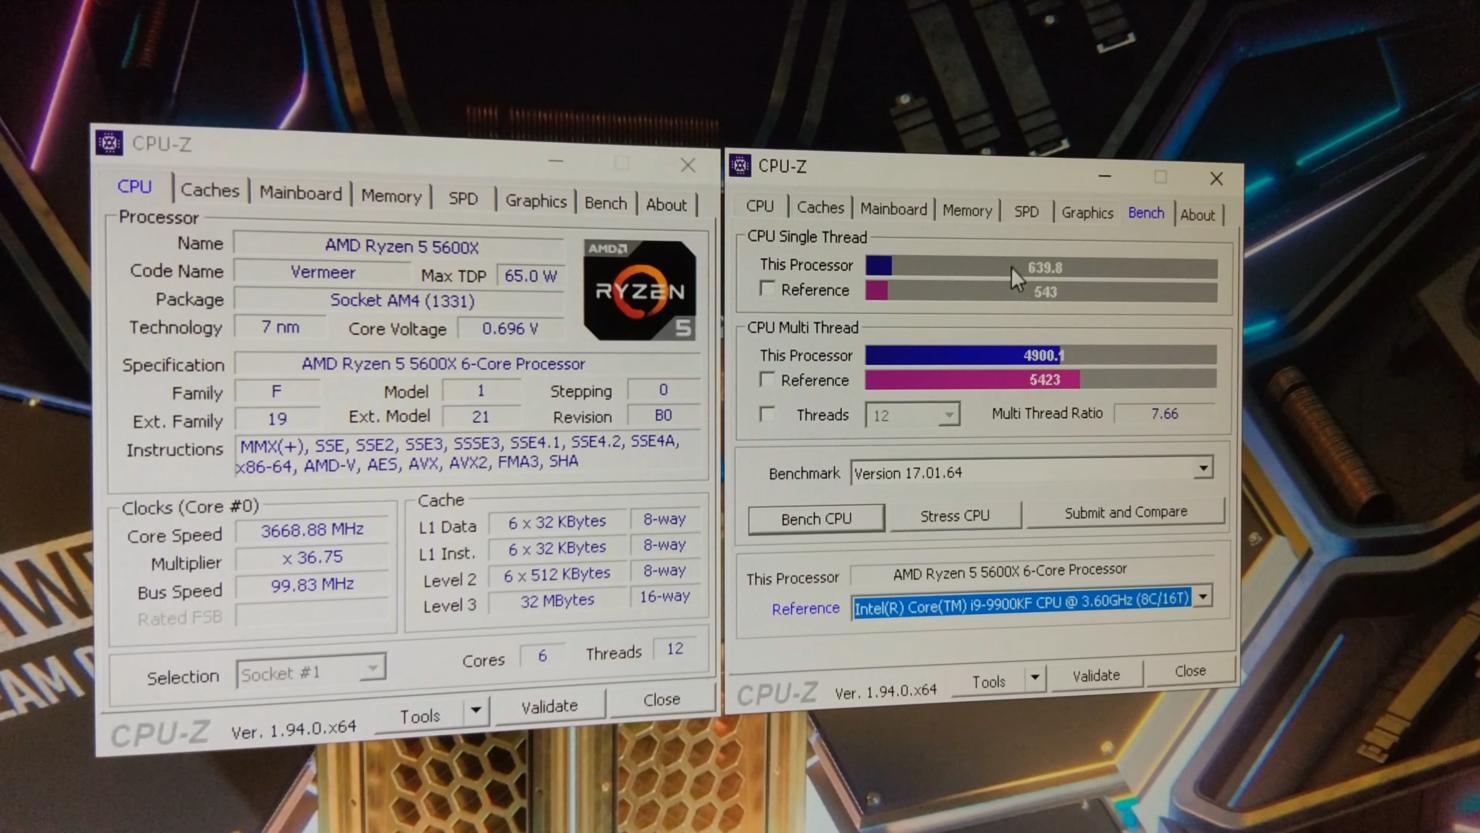 amd-ryzen-5-5600x-6-core-zen-3-cpu-benchmarks_stock_4